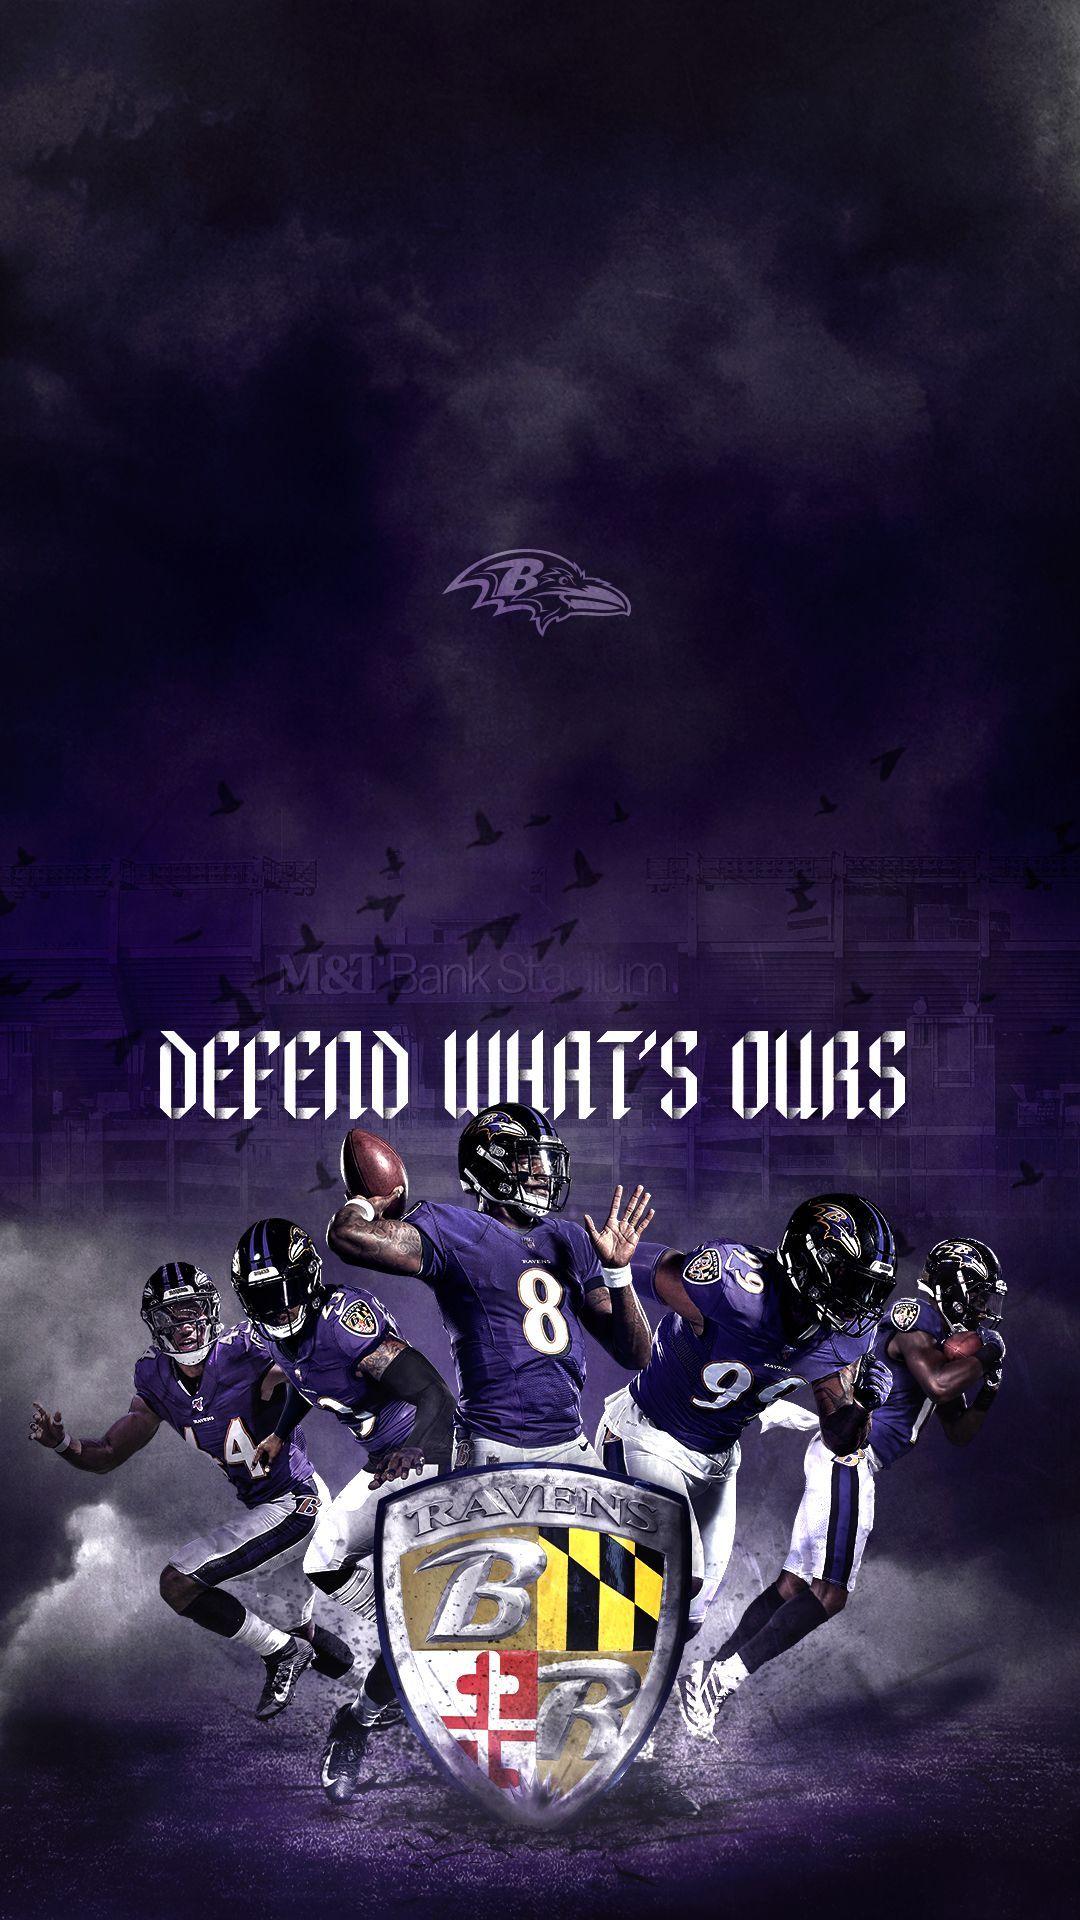 Trends For Iphone Nfl Ravens Wallpaper Images In 2020 Baltimore Ravens Wallpapers Baltimore Ravens Football Baltimore Ravens